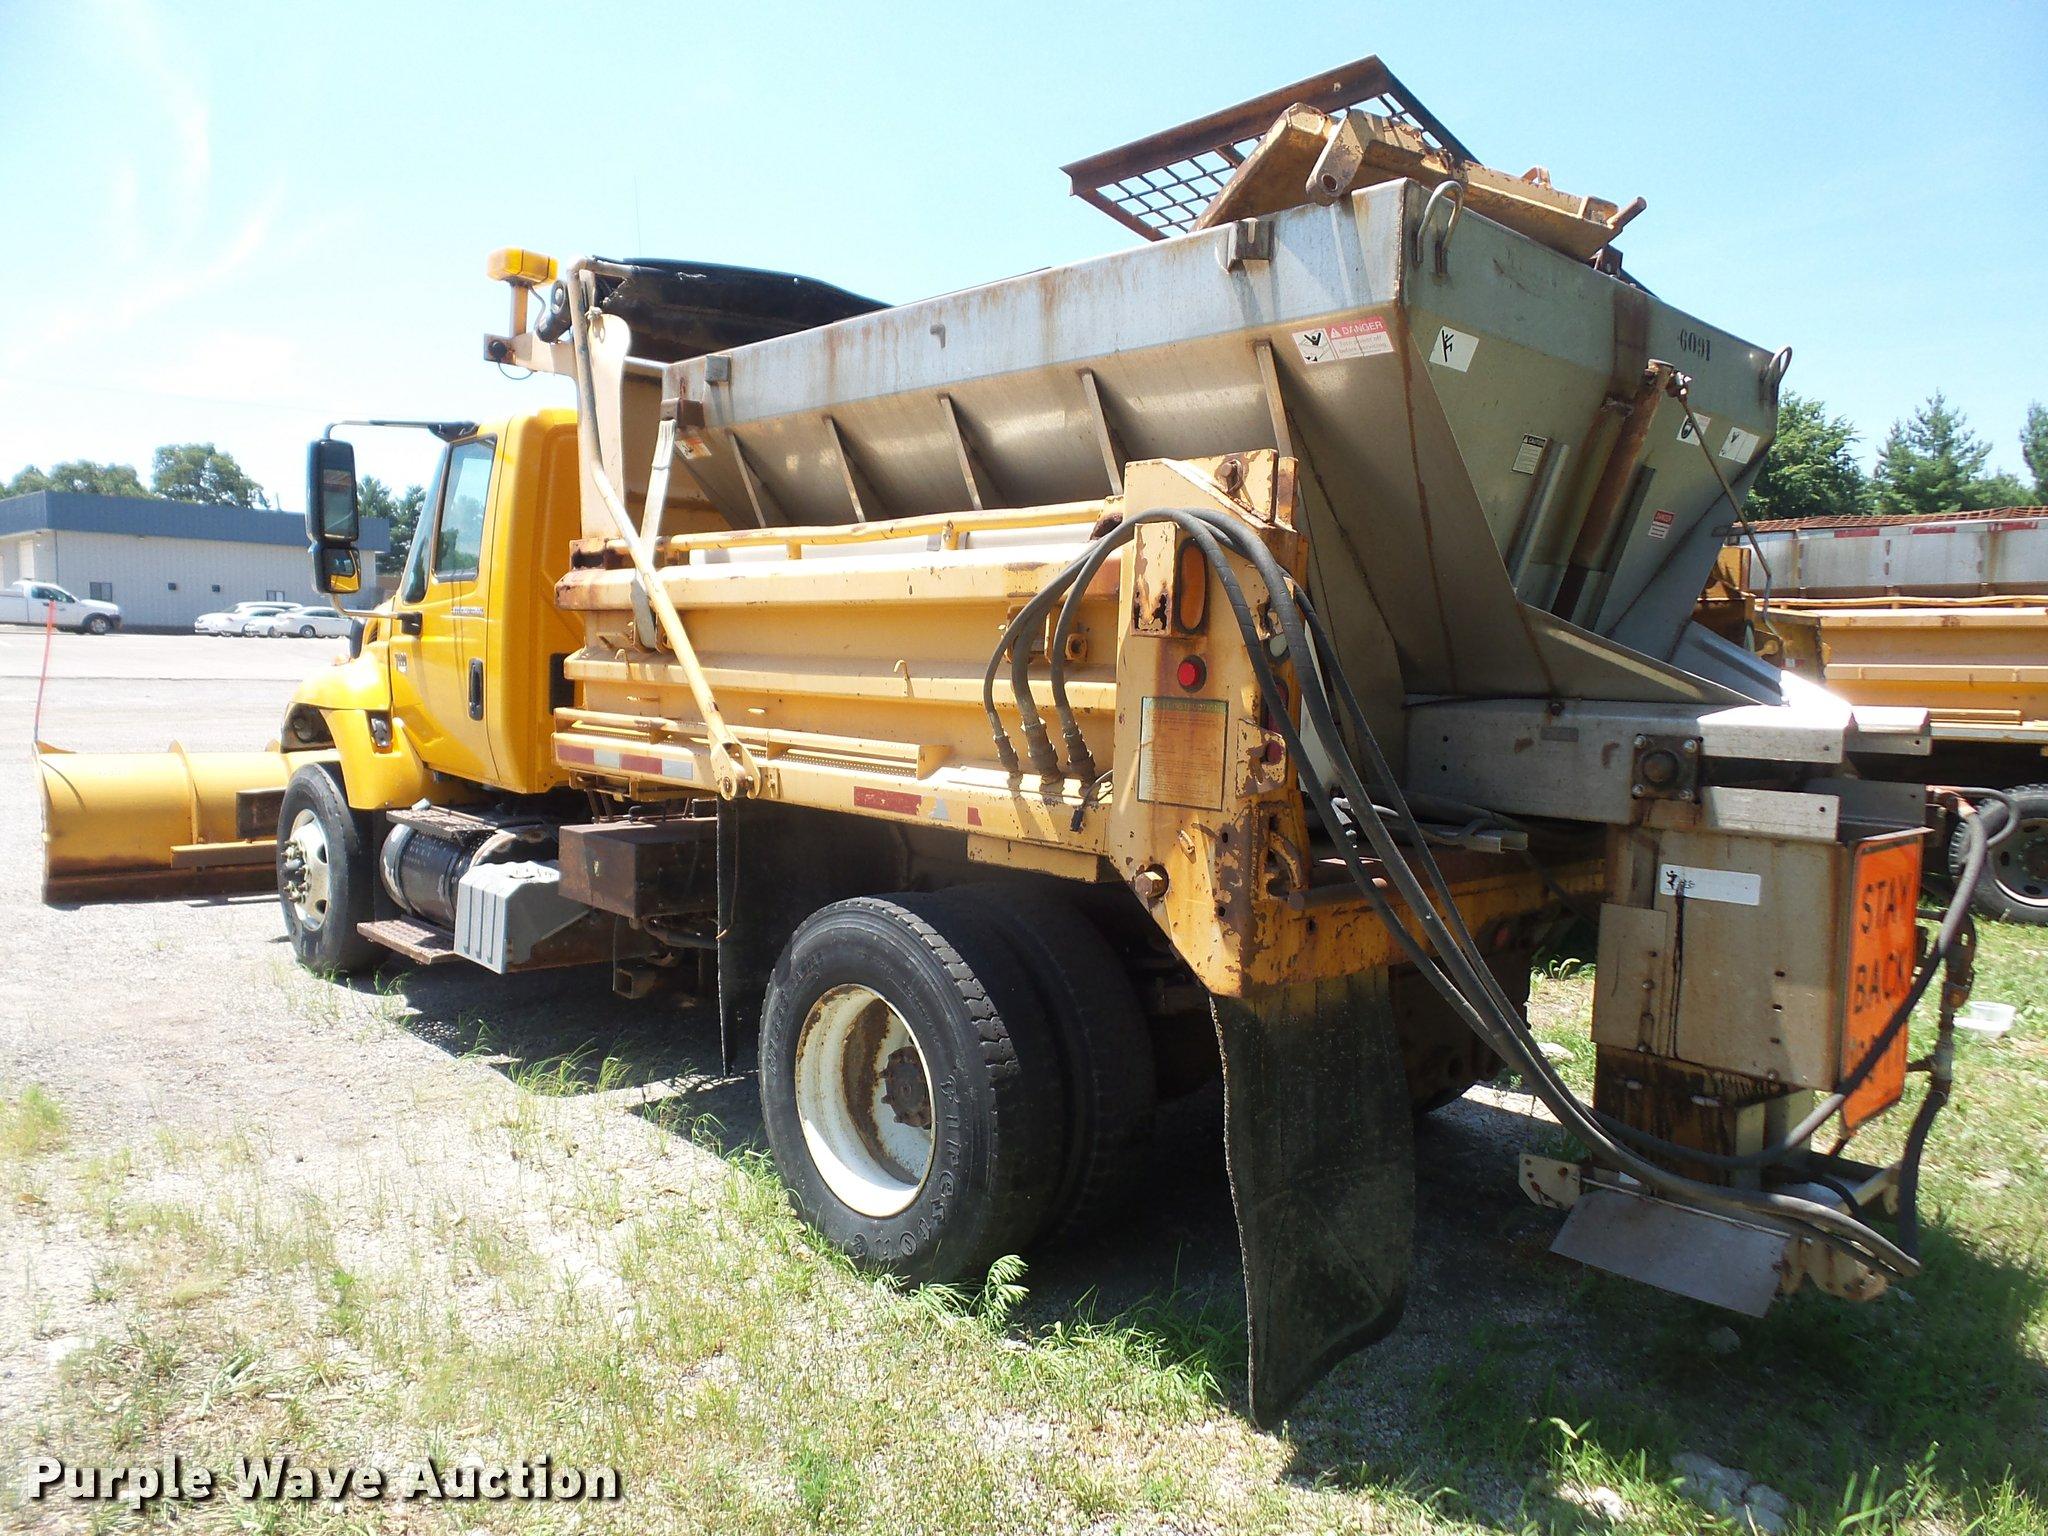 2002 International 7400 Dump Truck Item Da1596 Sold Aug Air Tank Schematic Full Size In New Window